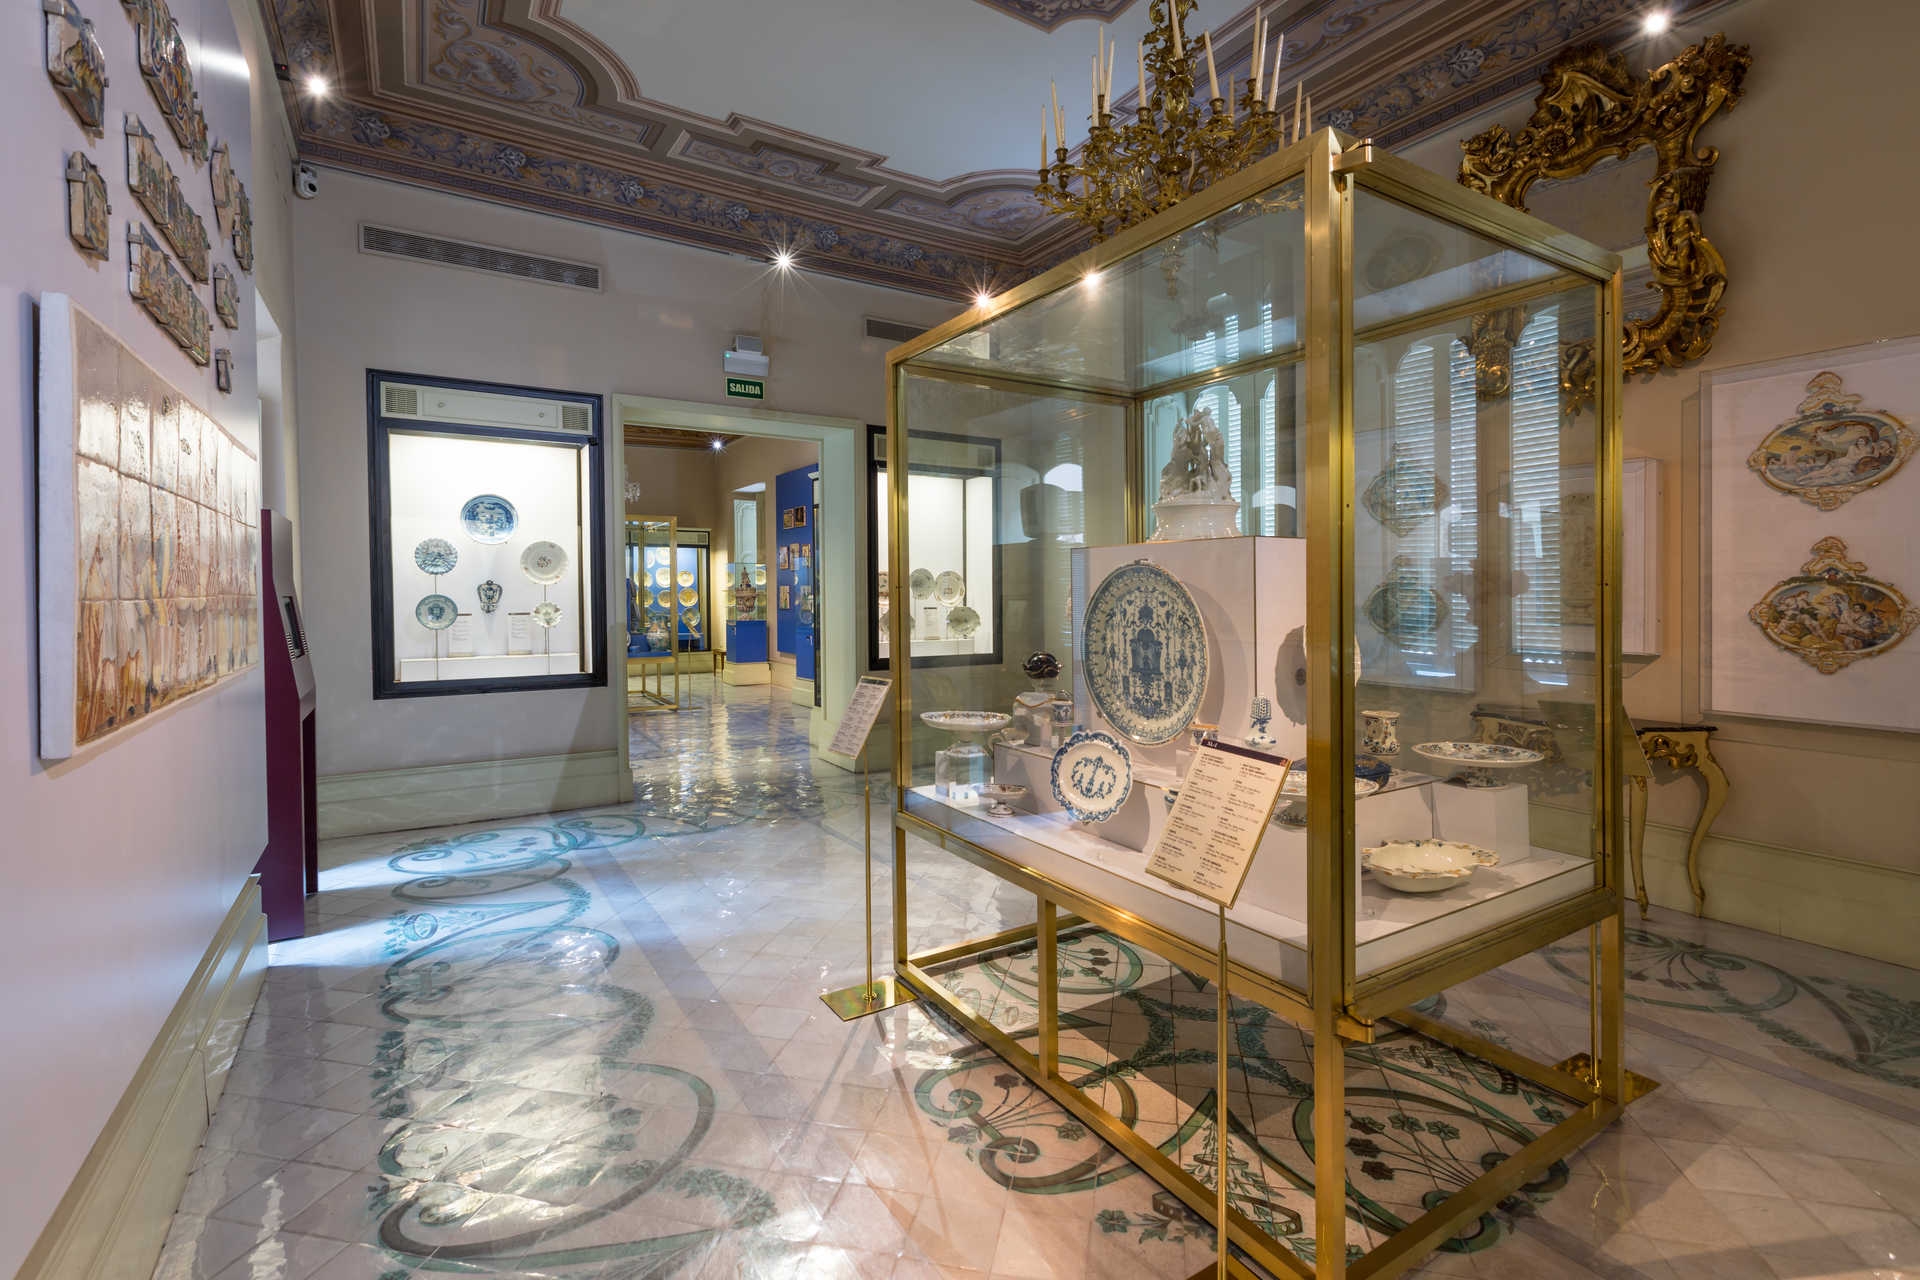 The National Ceramics And Sumptuary Arts Museum González Martí